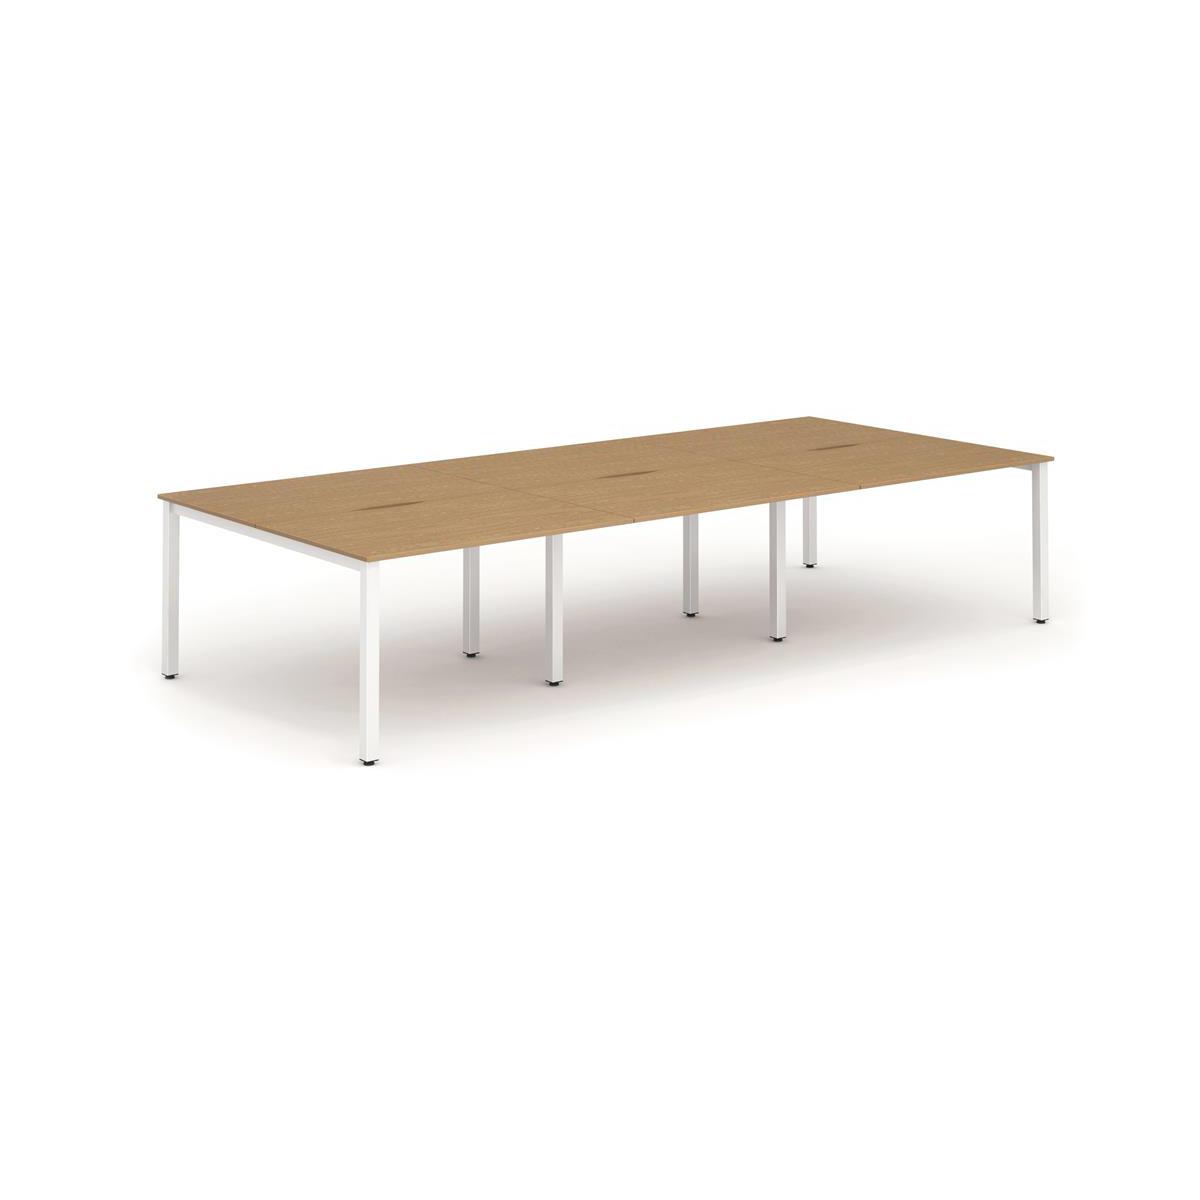 Trexus Bench Desk 6 Person Back to Back Configuration White Leg 4800x1600mm Oak Ref BE268